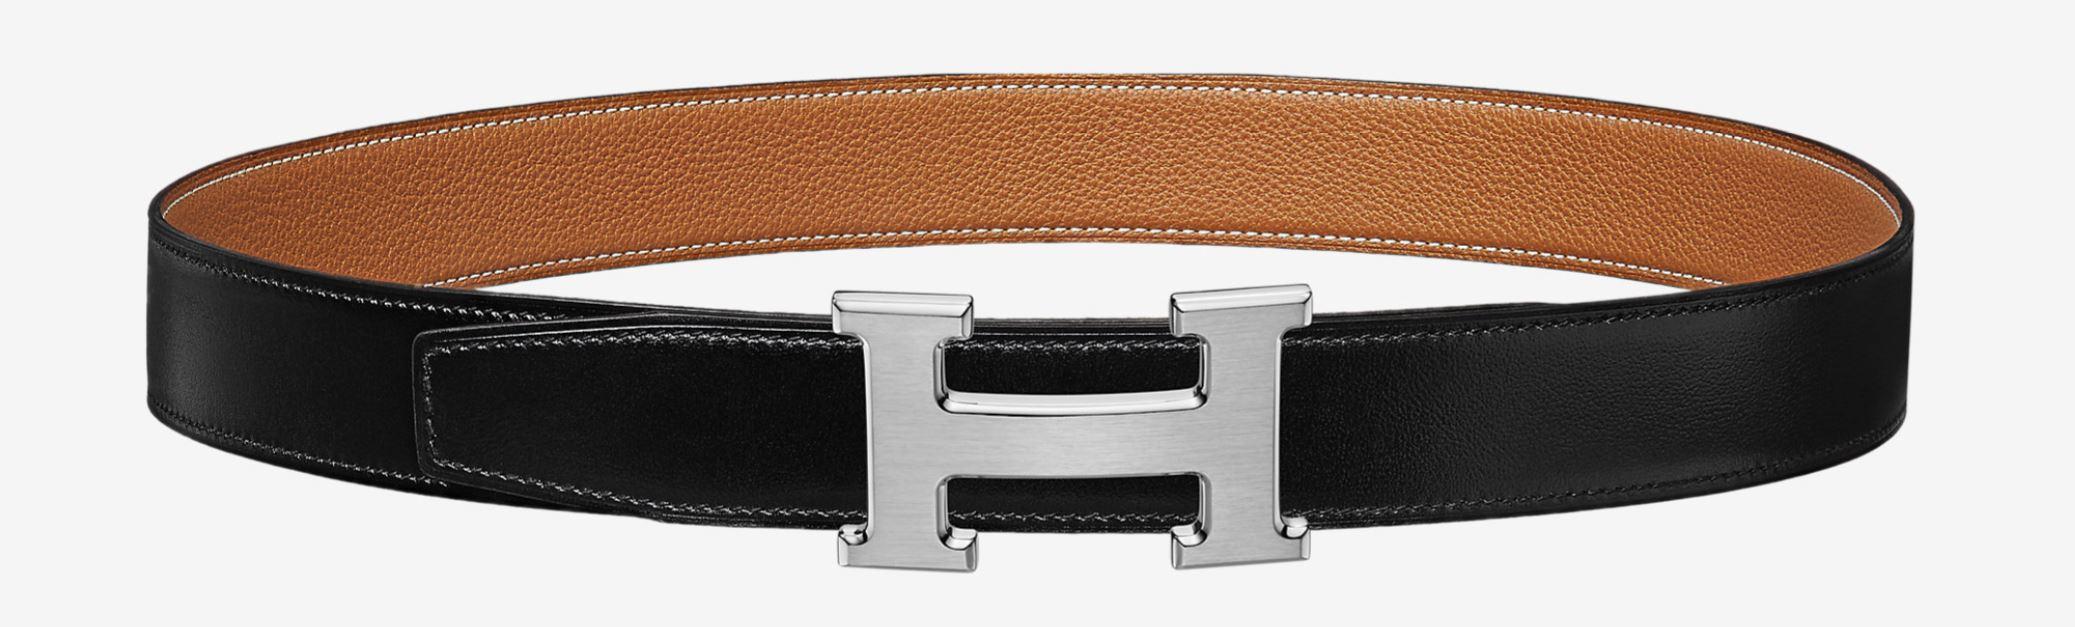 Hermes black and brown belt